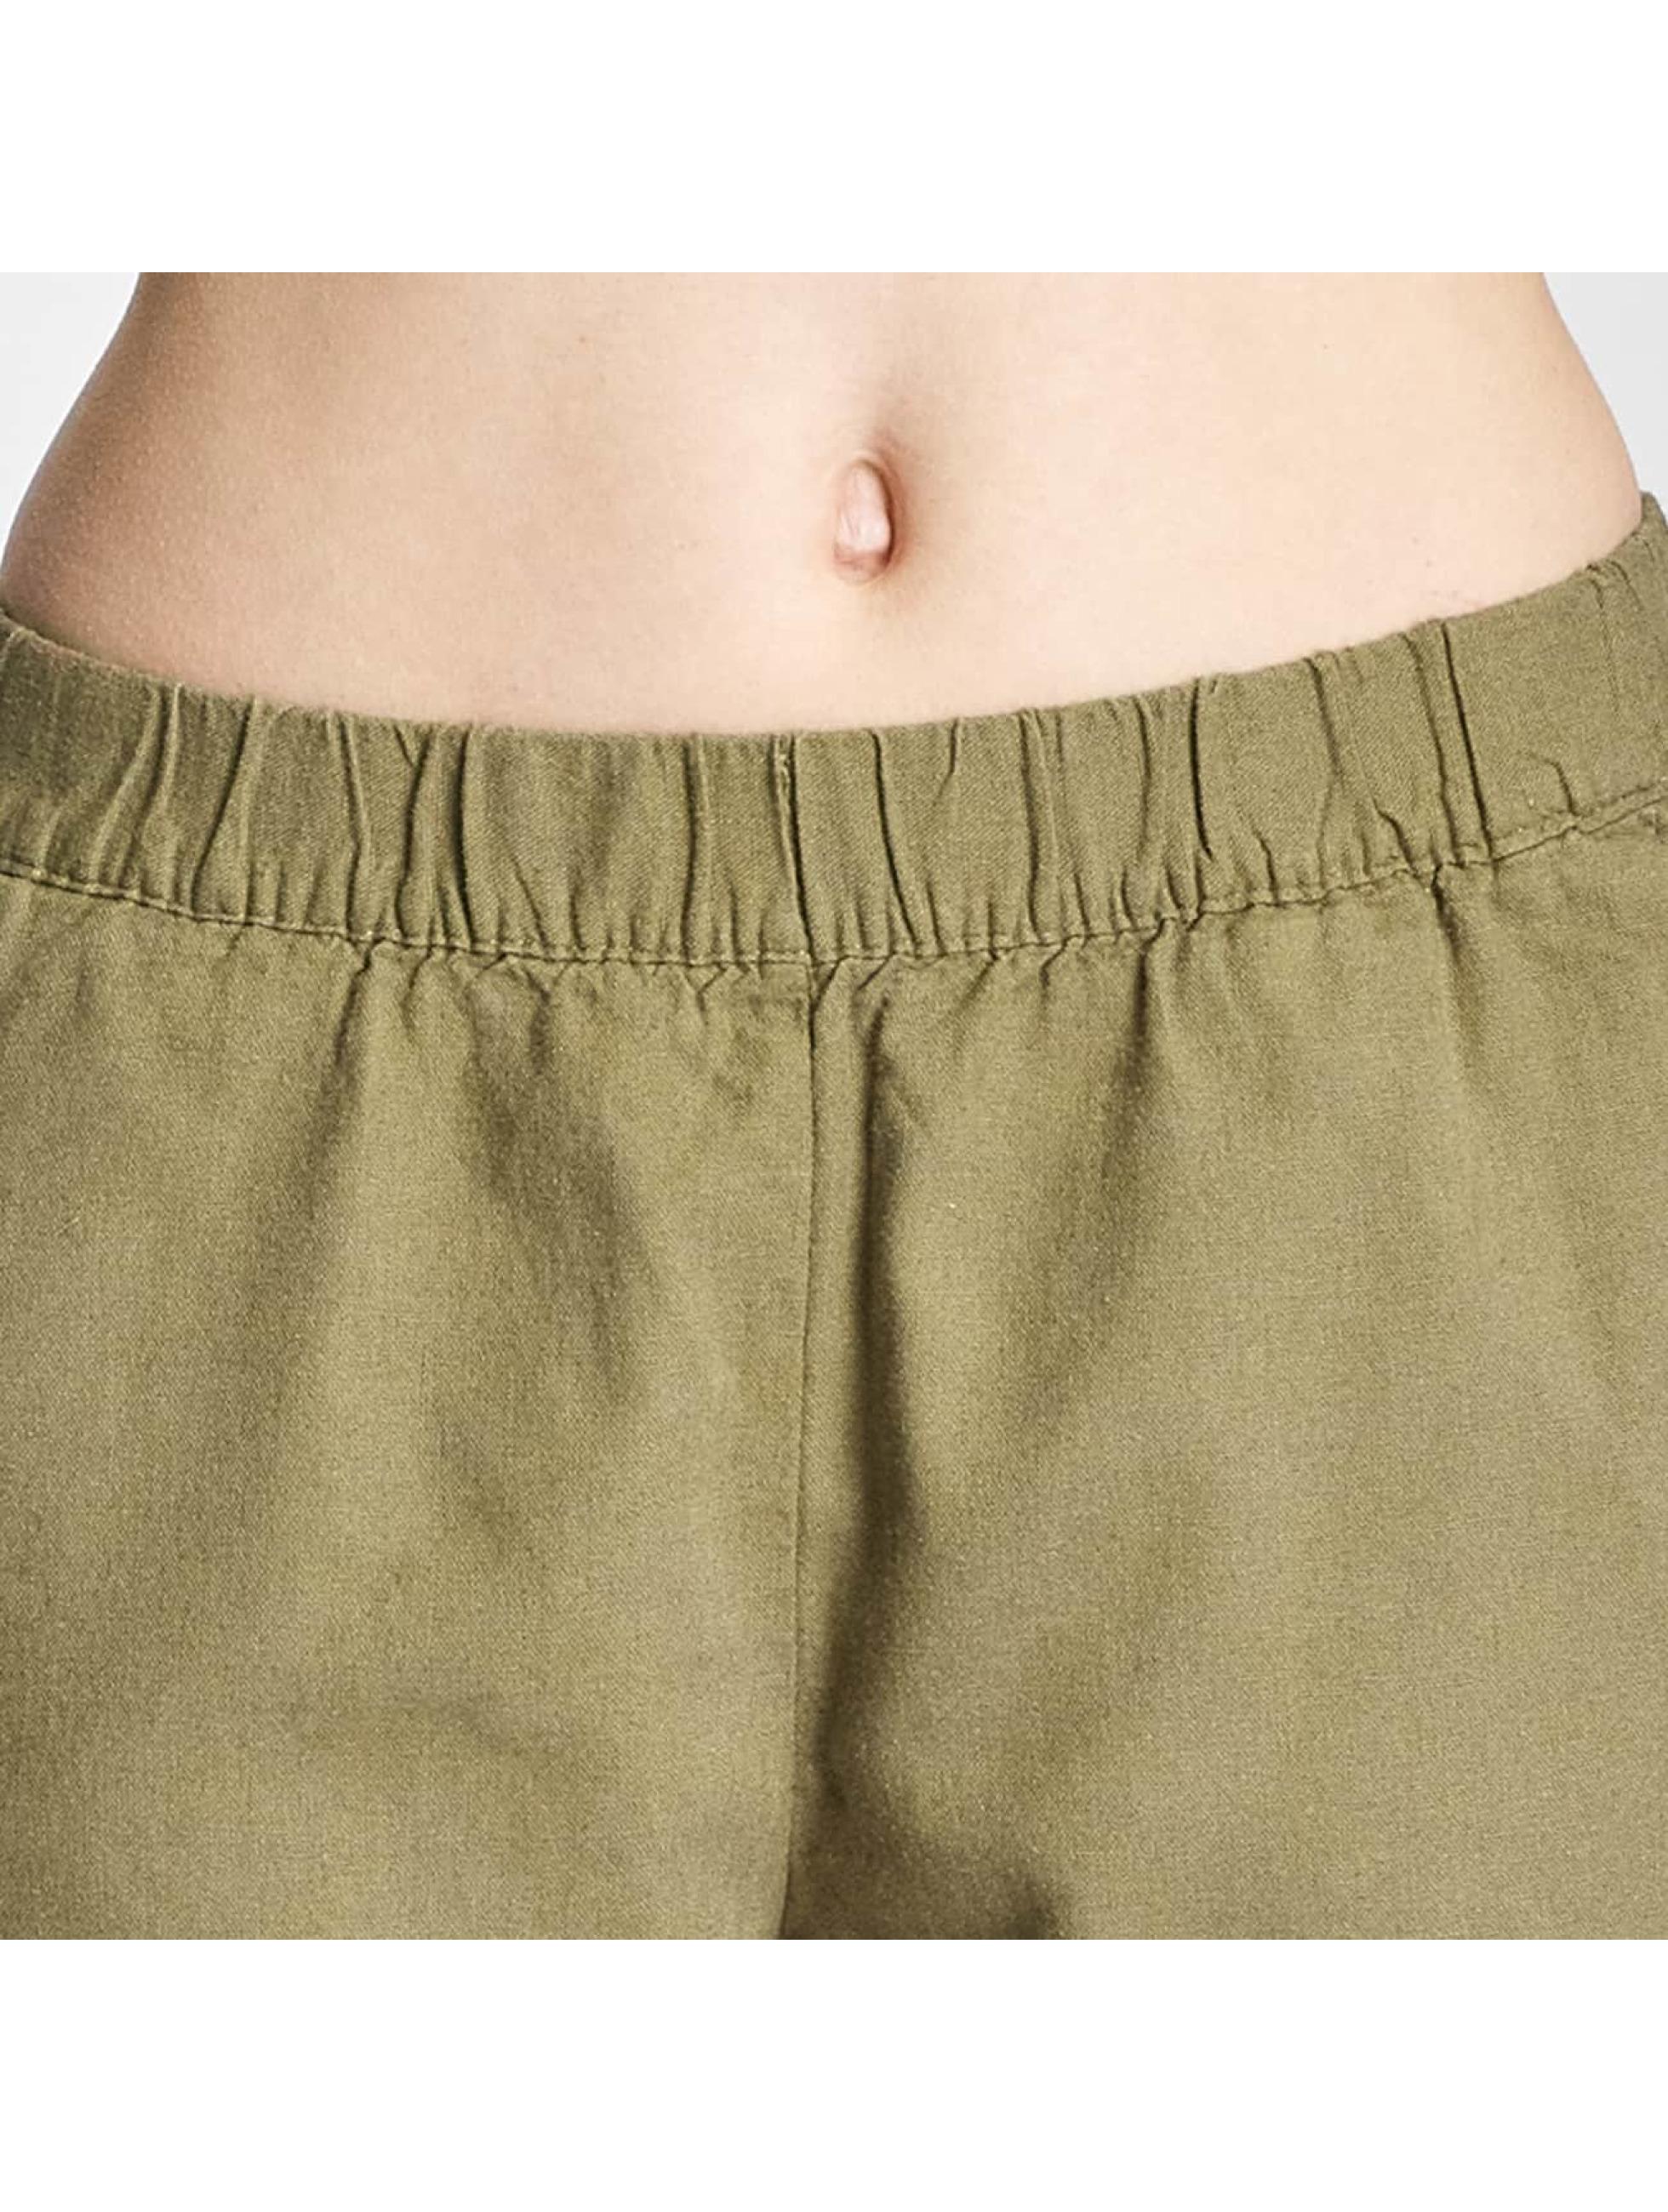 Vero Moda Shorts VMMilo grön